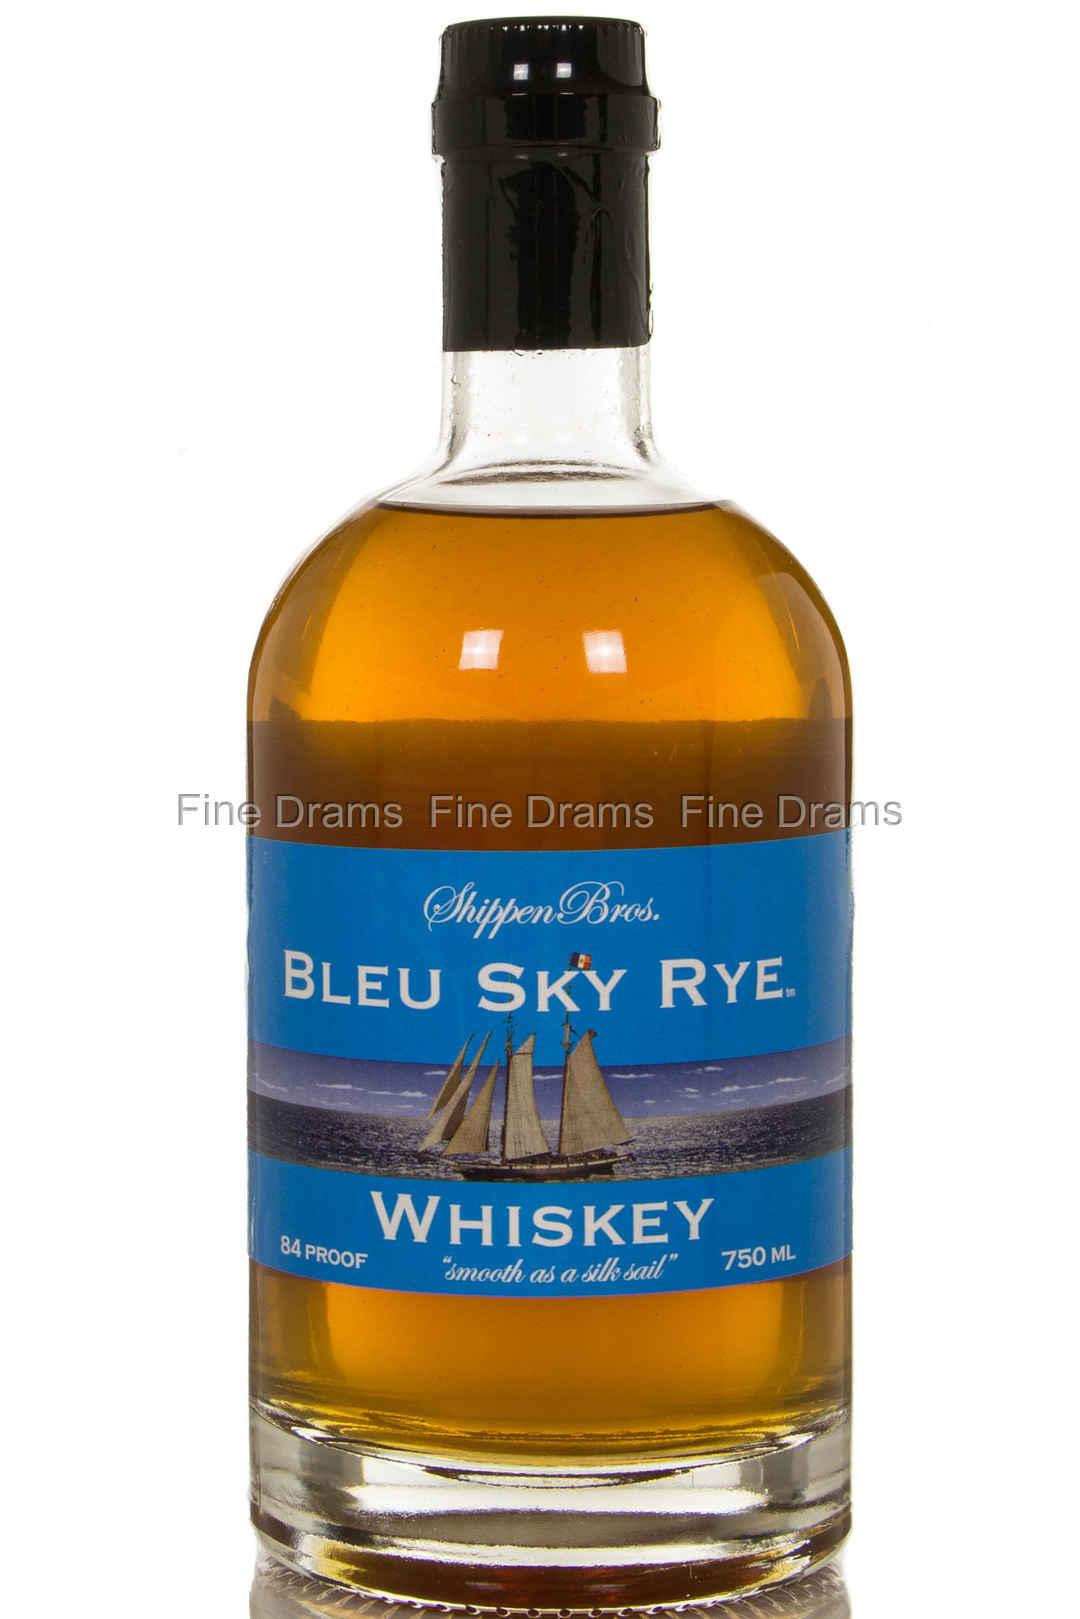 Blue Skye Rye American Rye Whiskey